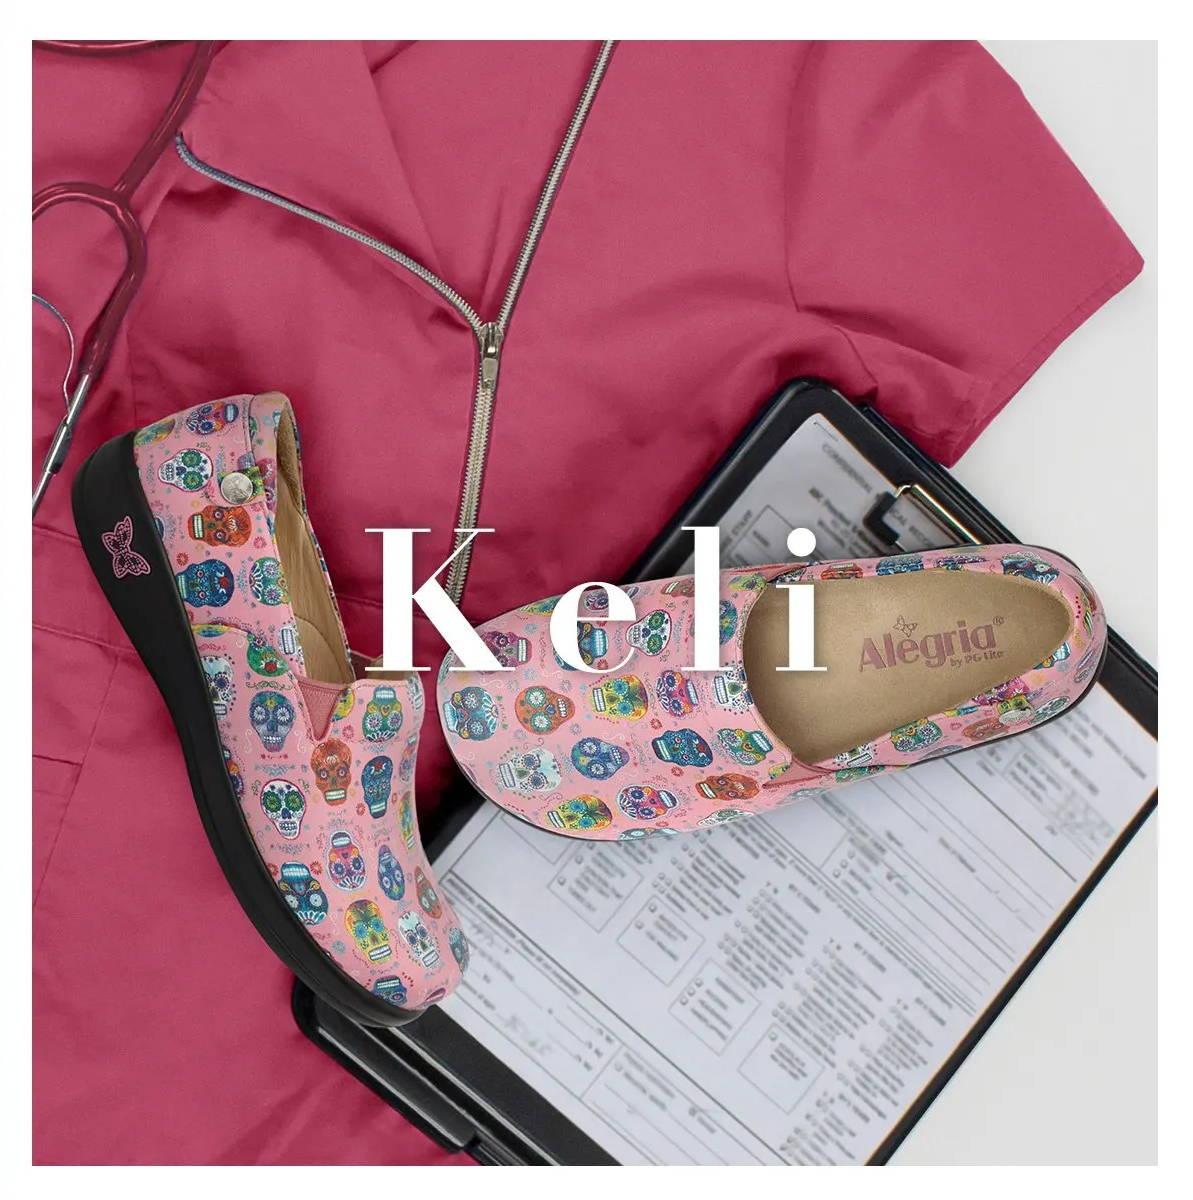 Alegria Keli professional collection - in Sugar Skulls Pink